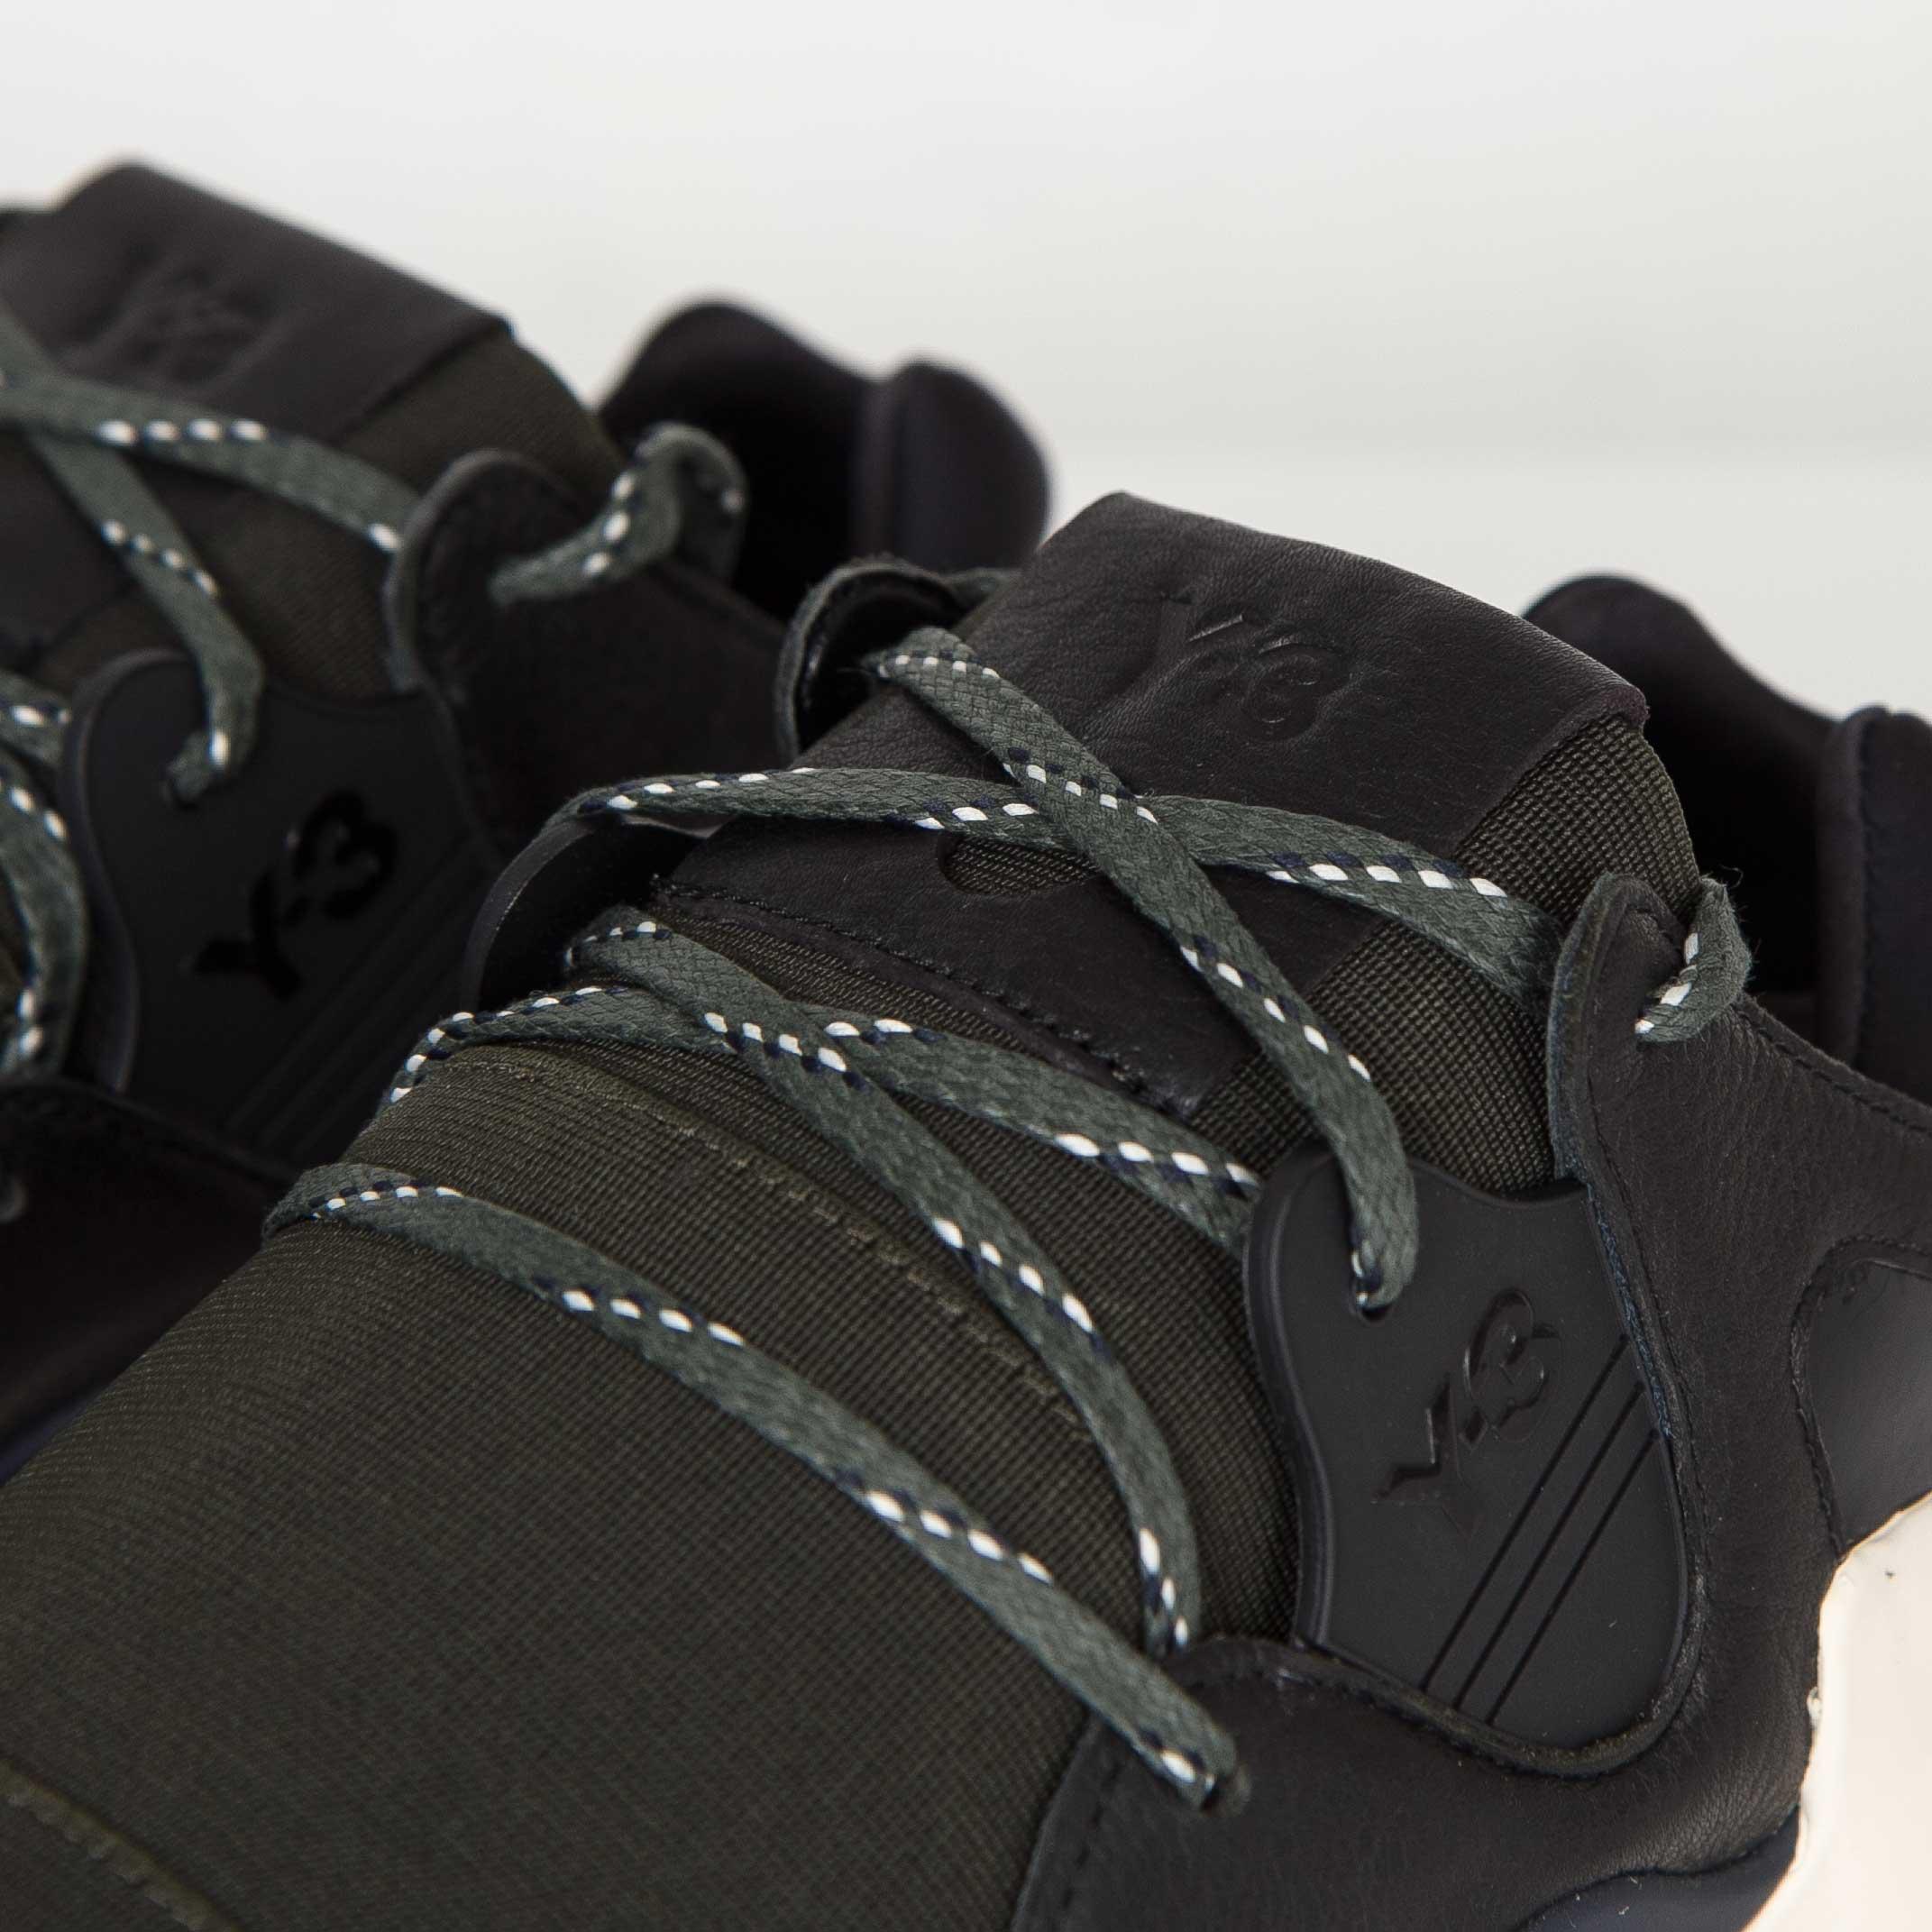 e7c9cd31342a adidas Y-3 Boost QR - S77939 - Sneakersnstuff